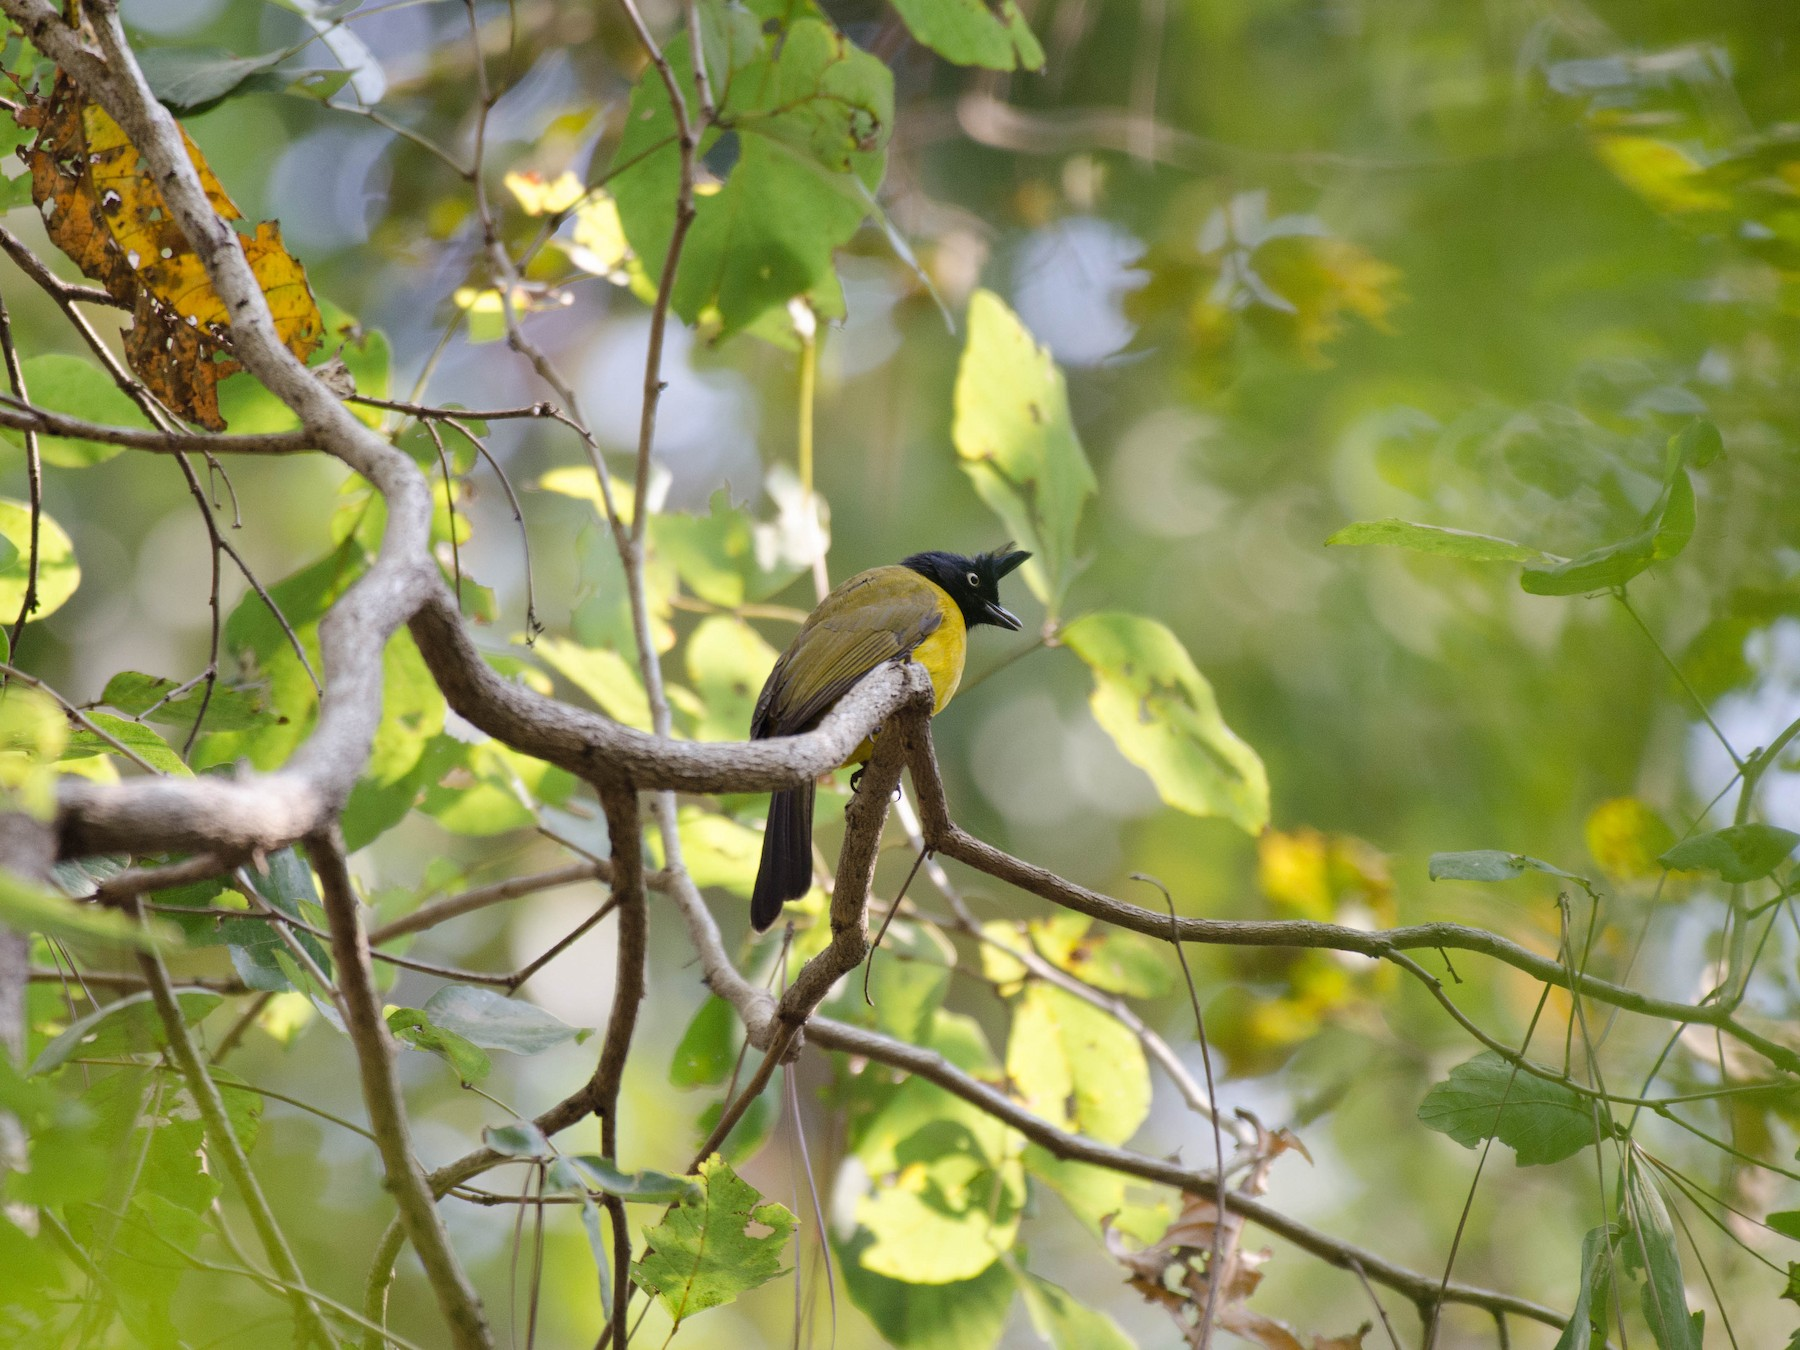 Black-crested Bulbul - Ankur Shekdar